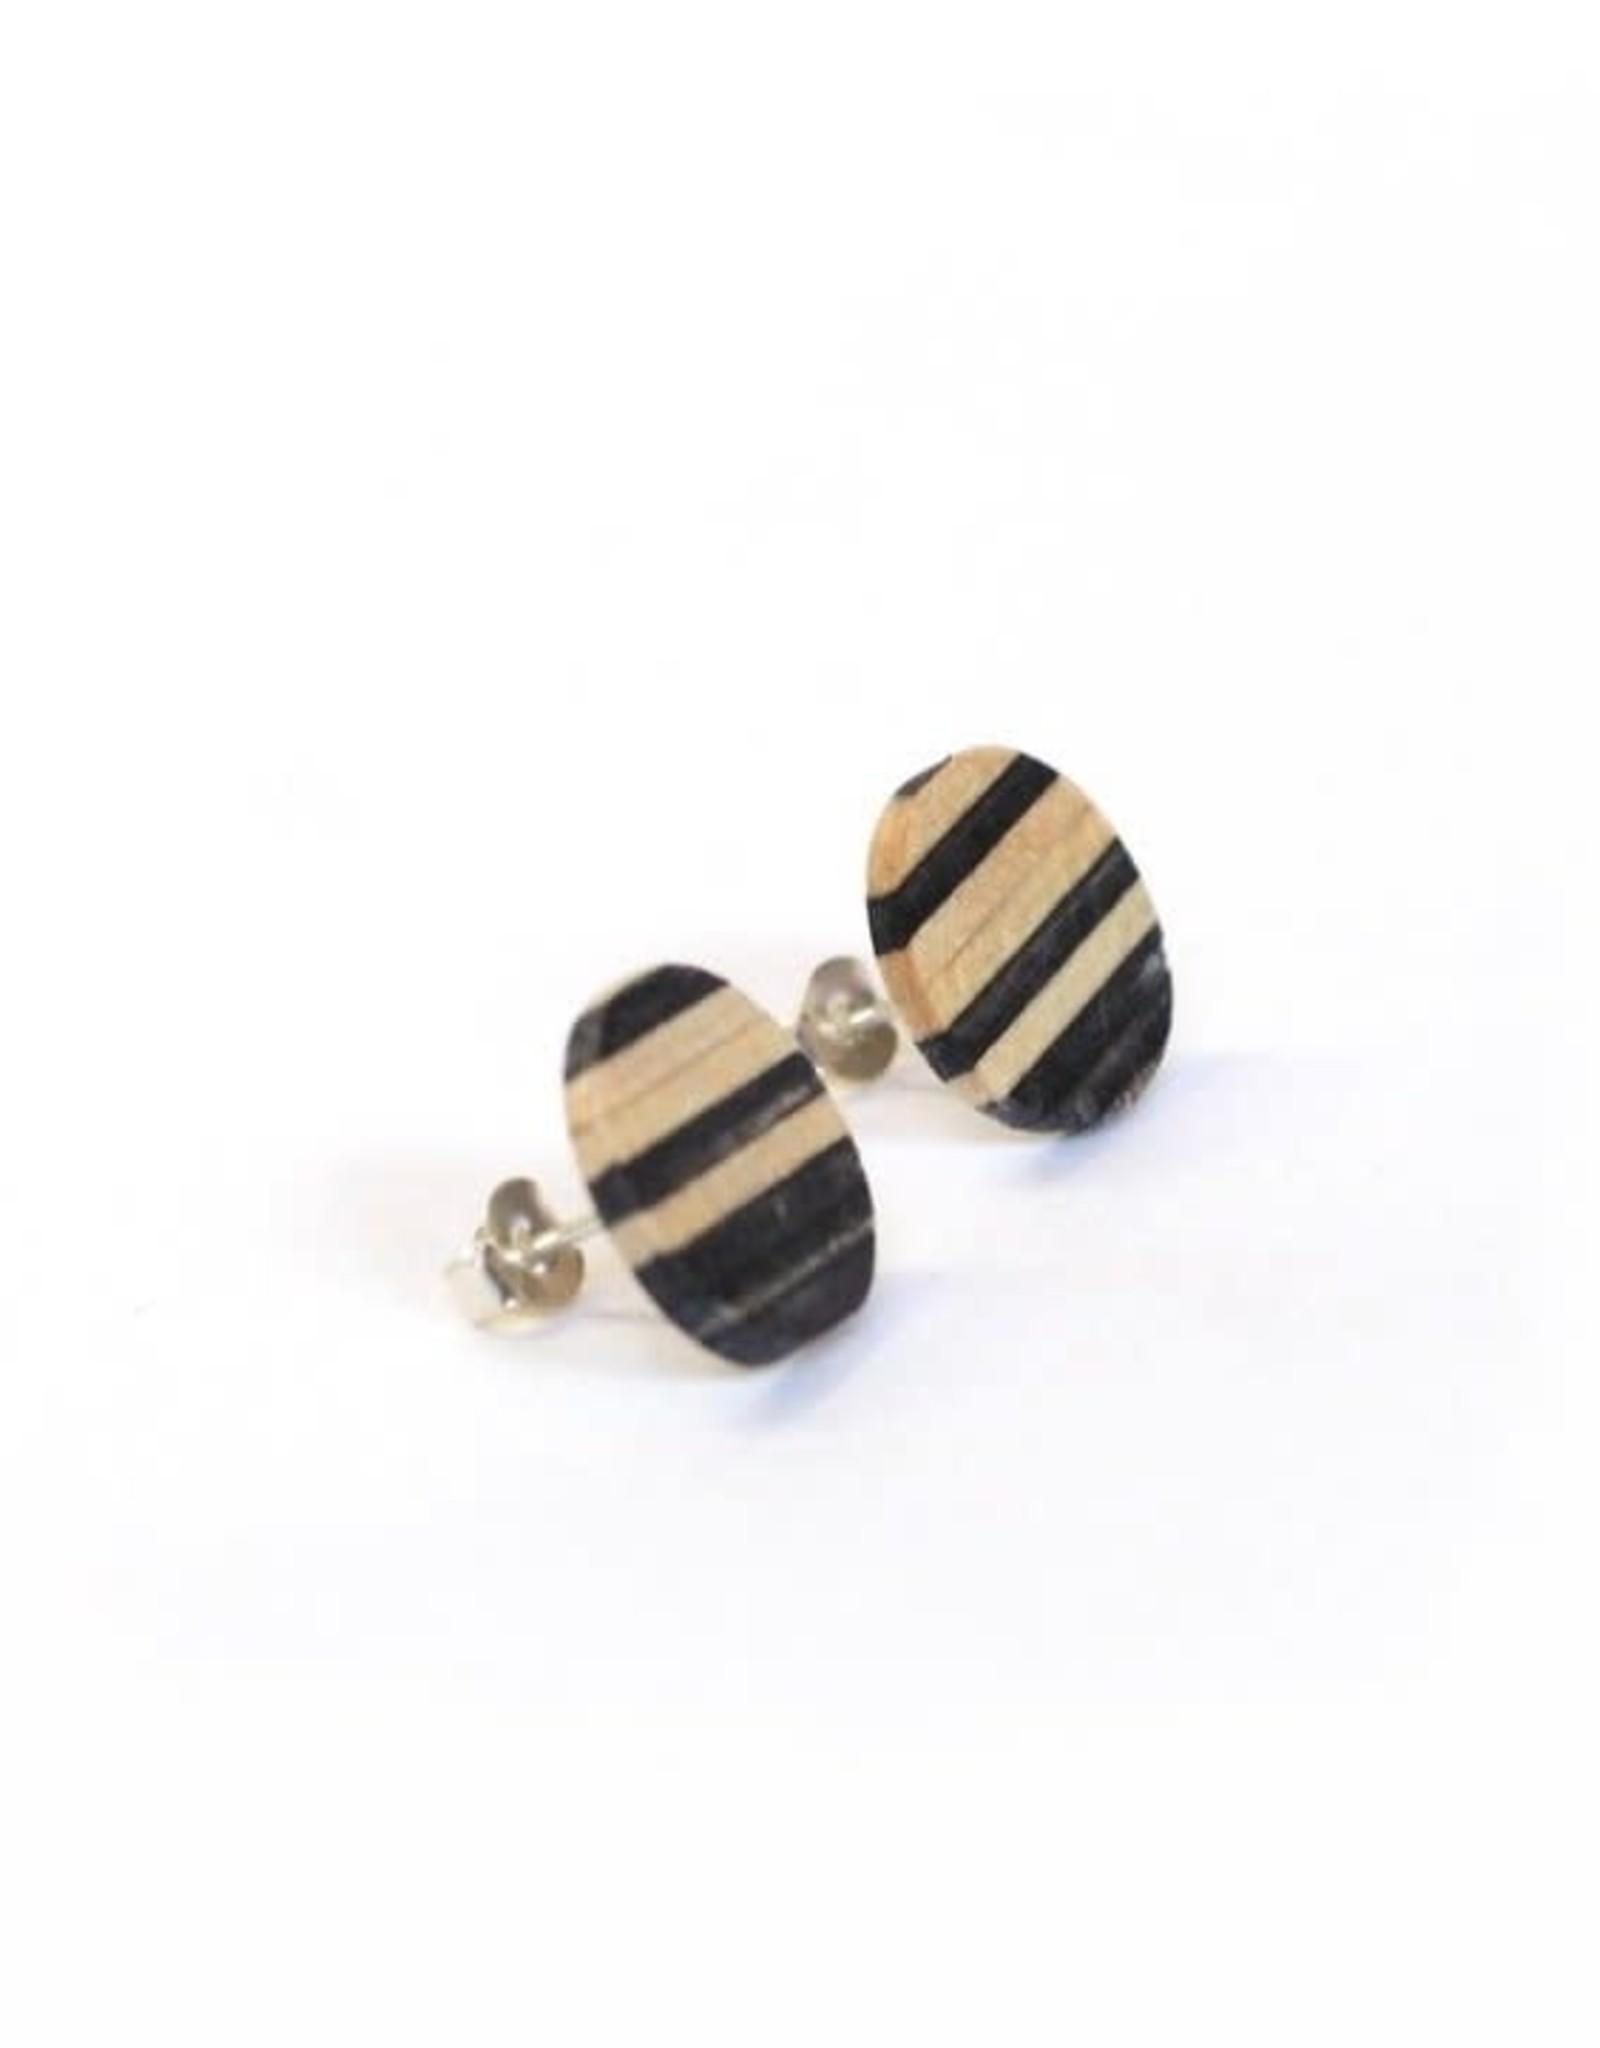 Maple XO Strata Stud Earrings - Maple XO